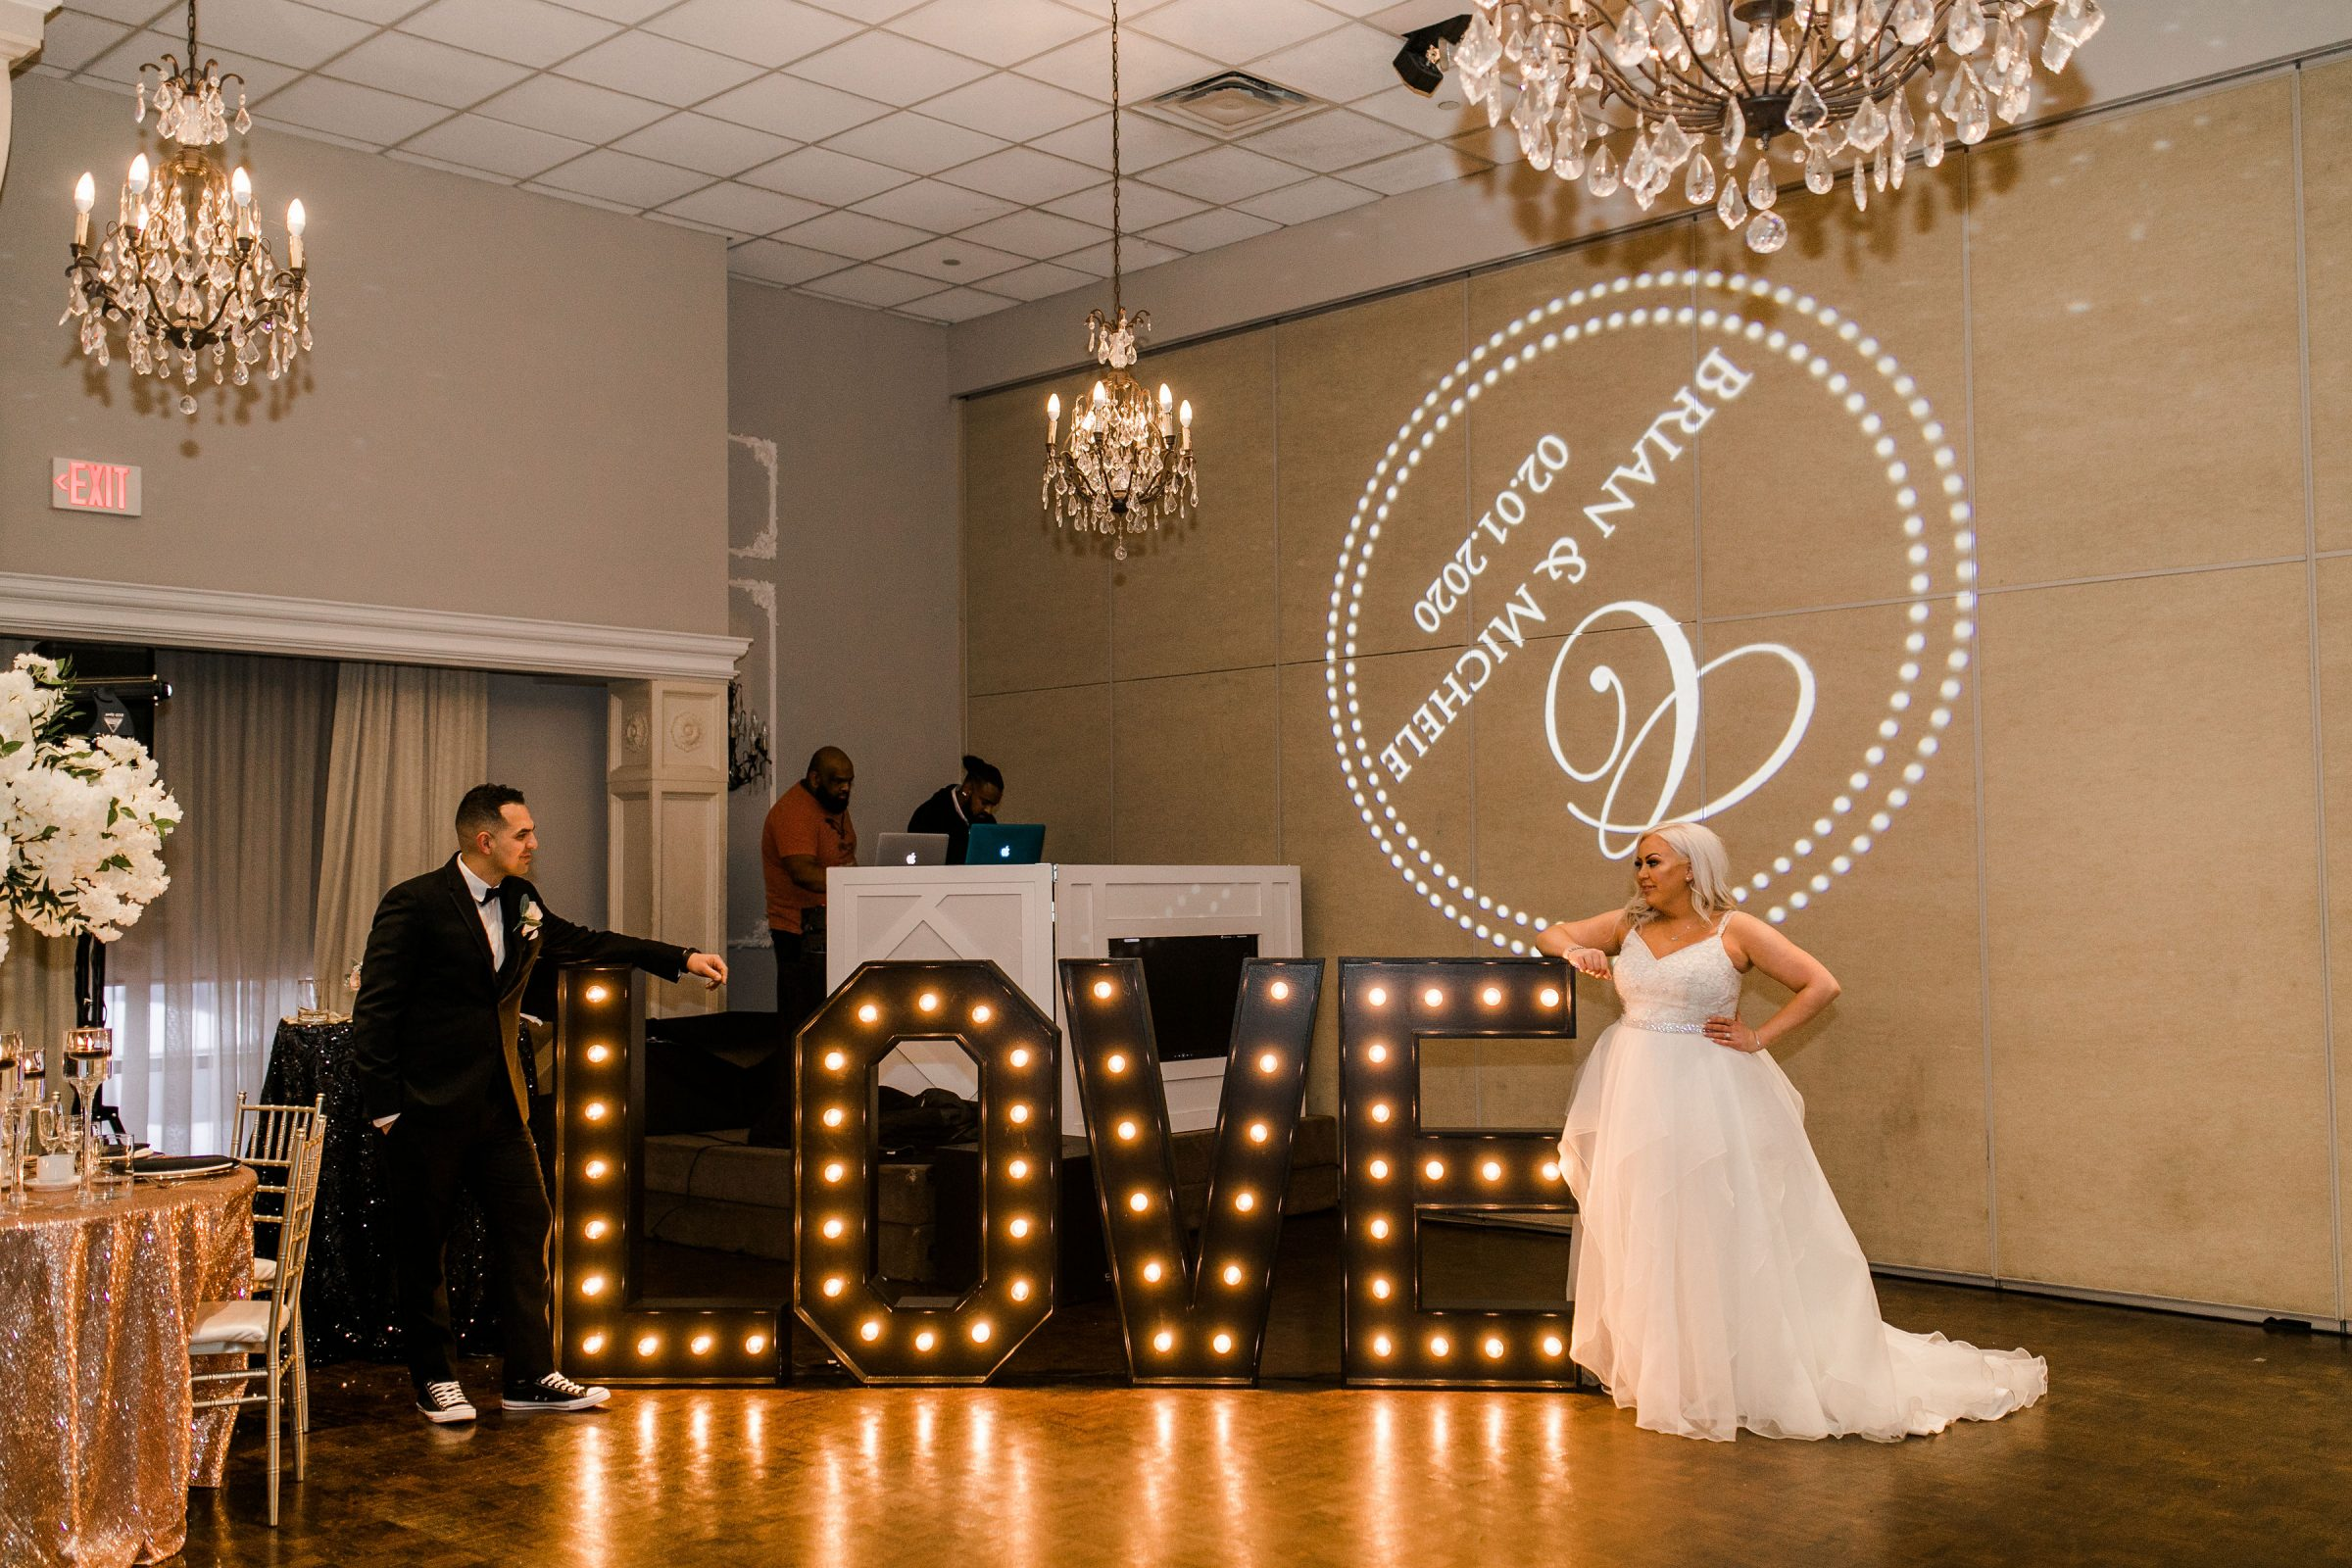 Love Light floor feature for Wedding